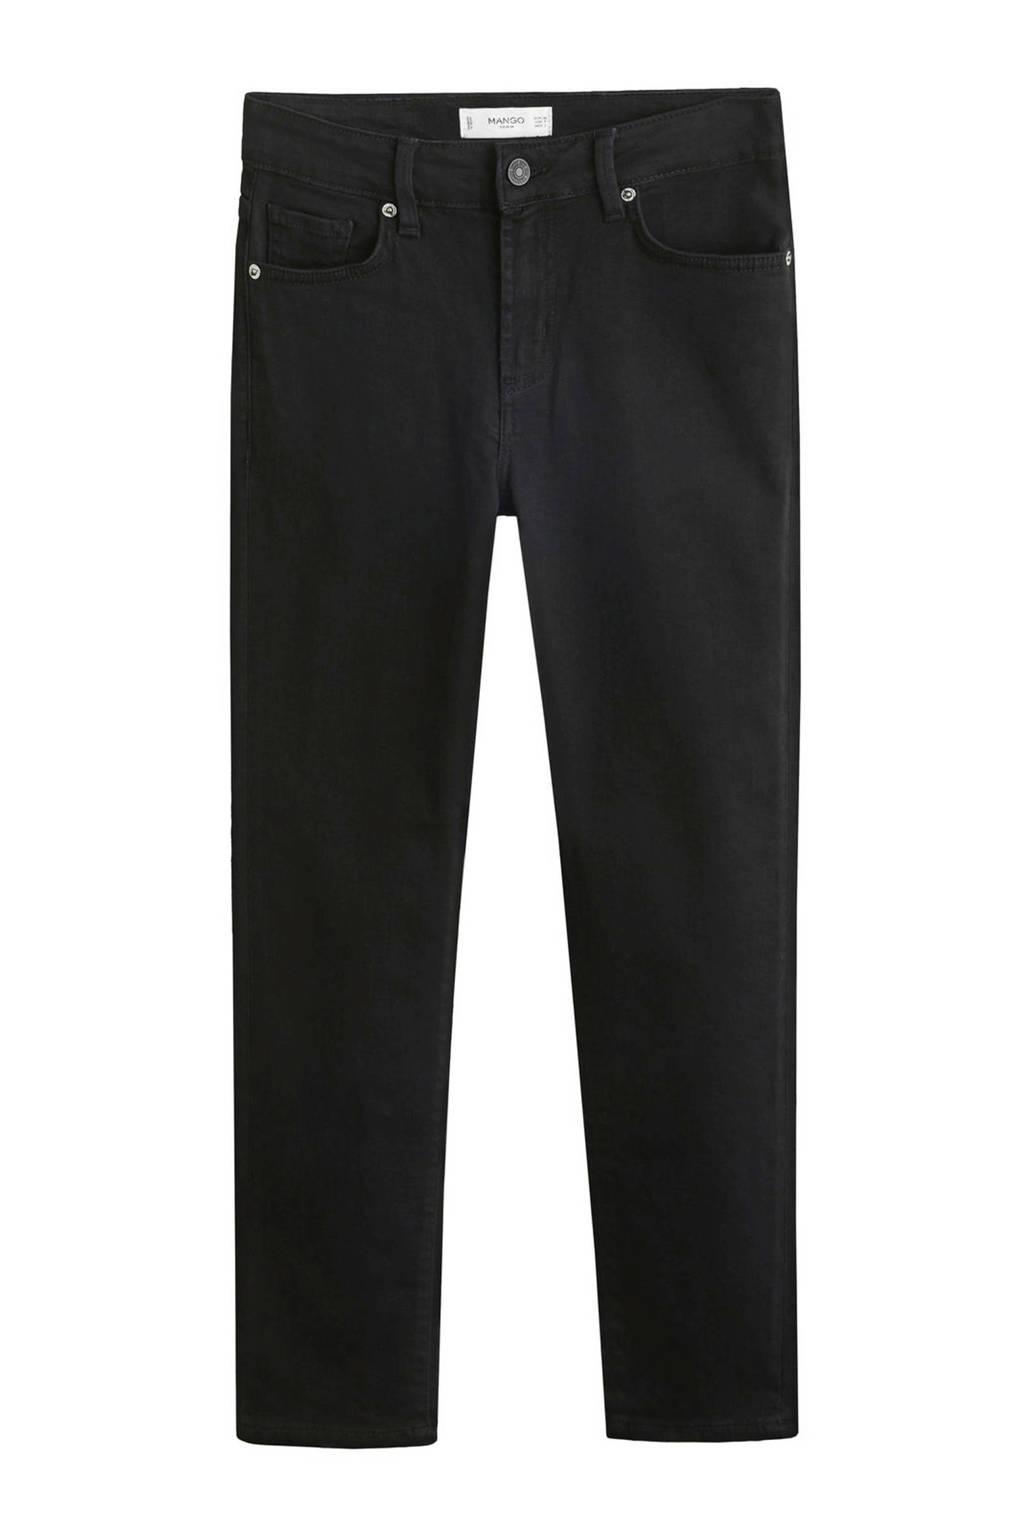 Mango skinny fit 7/8 jeans grijs, Grijs